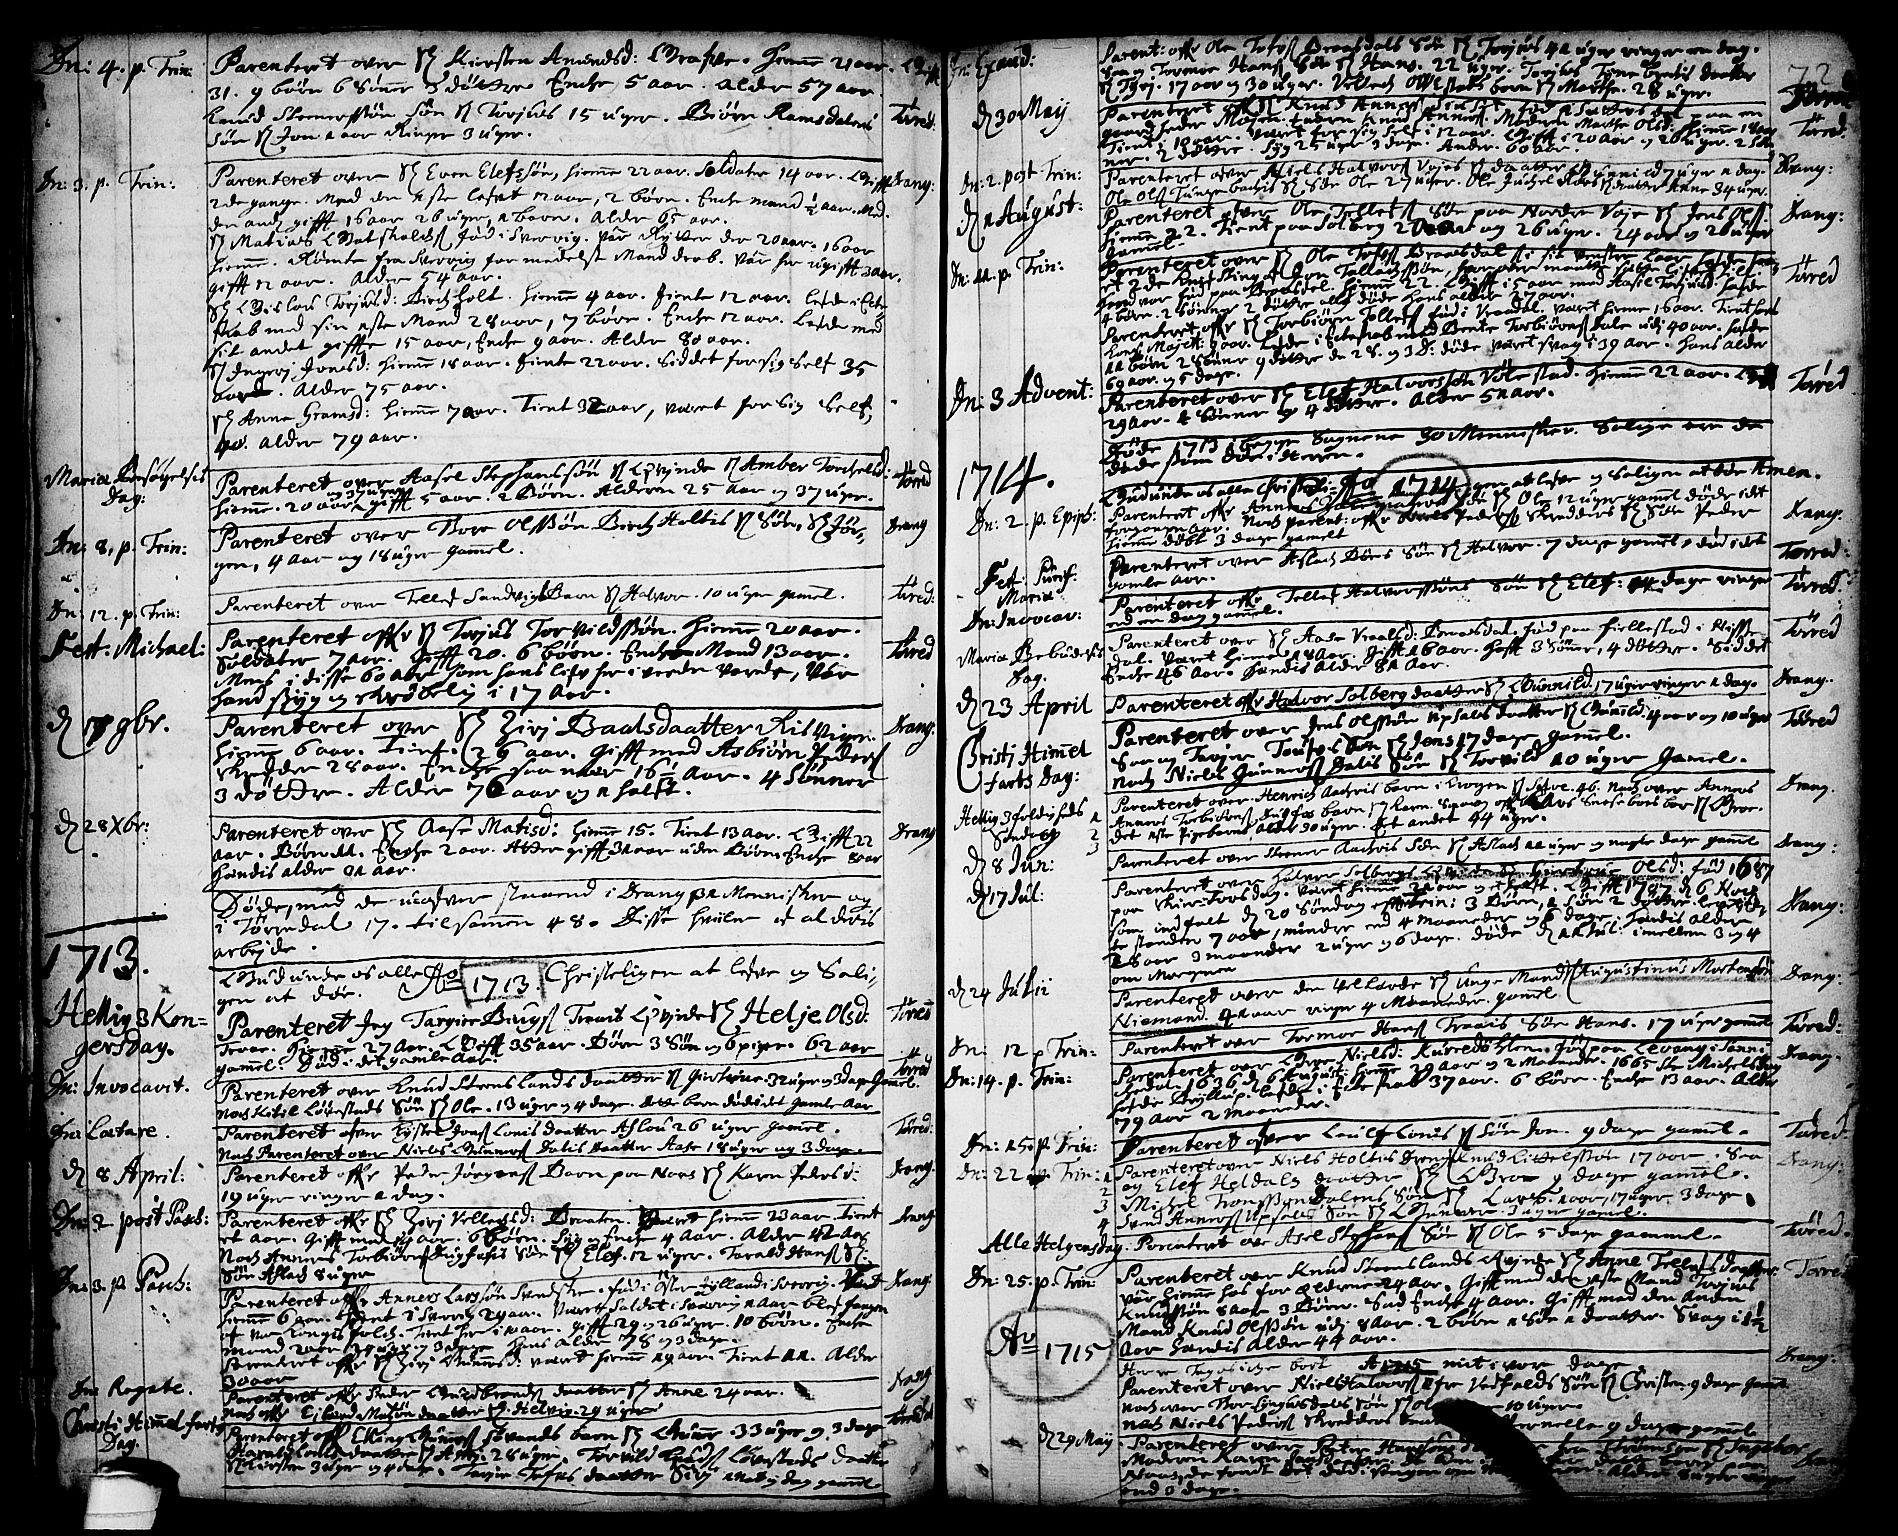 SAKO, Drangedal kirkebøker, F/Fa/L0001: Ministerialbok nr. 1, 1697-1767, s. 72